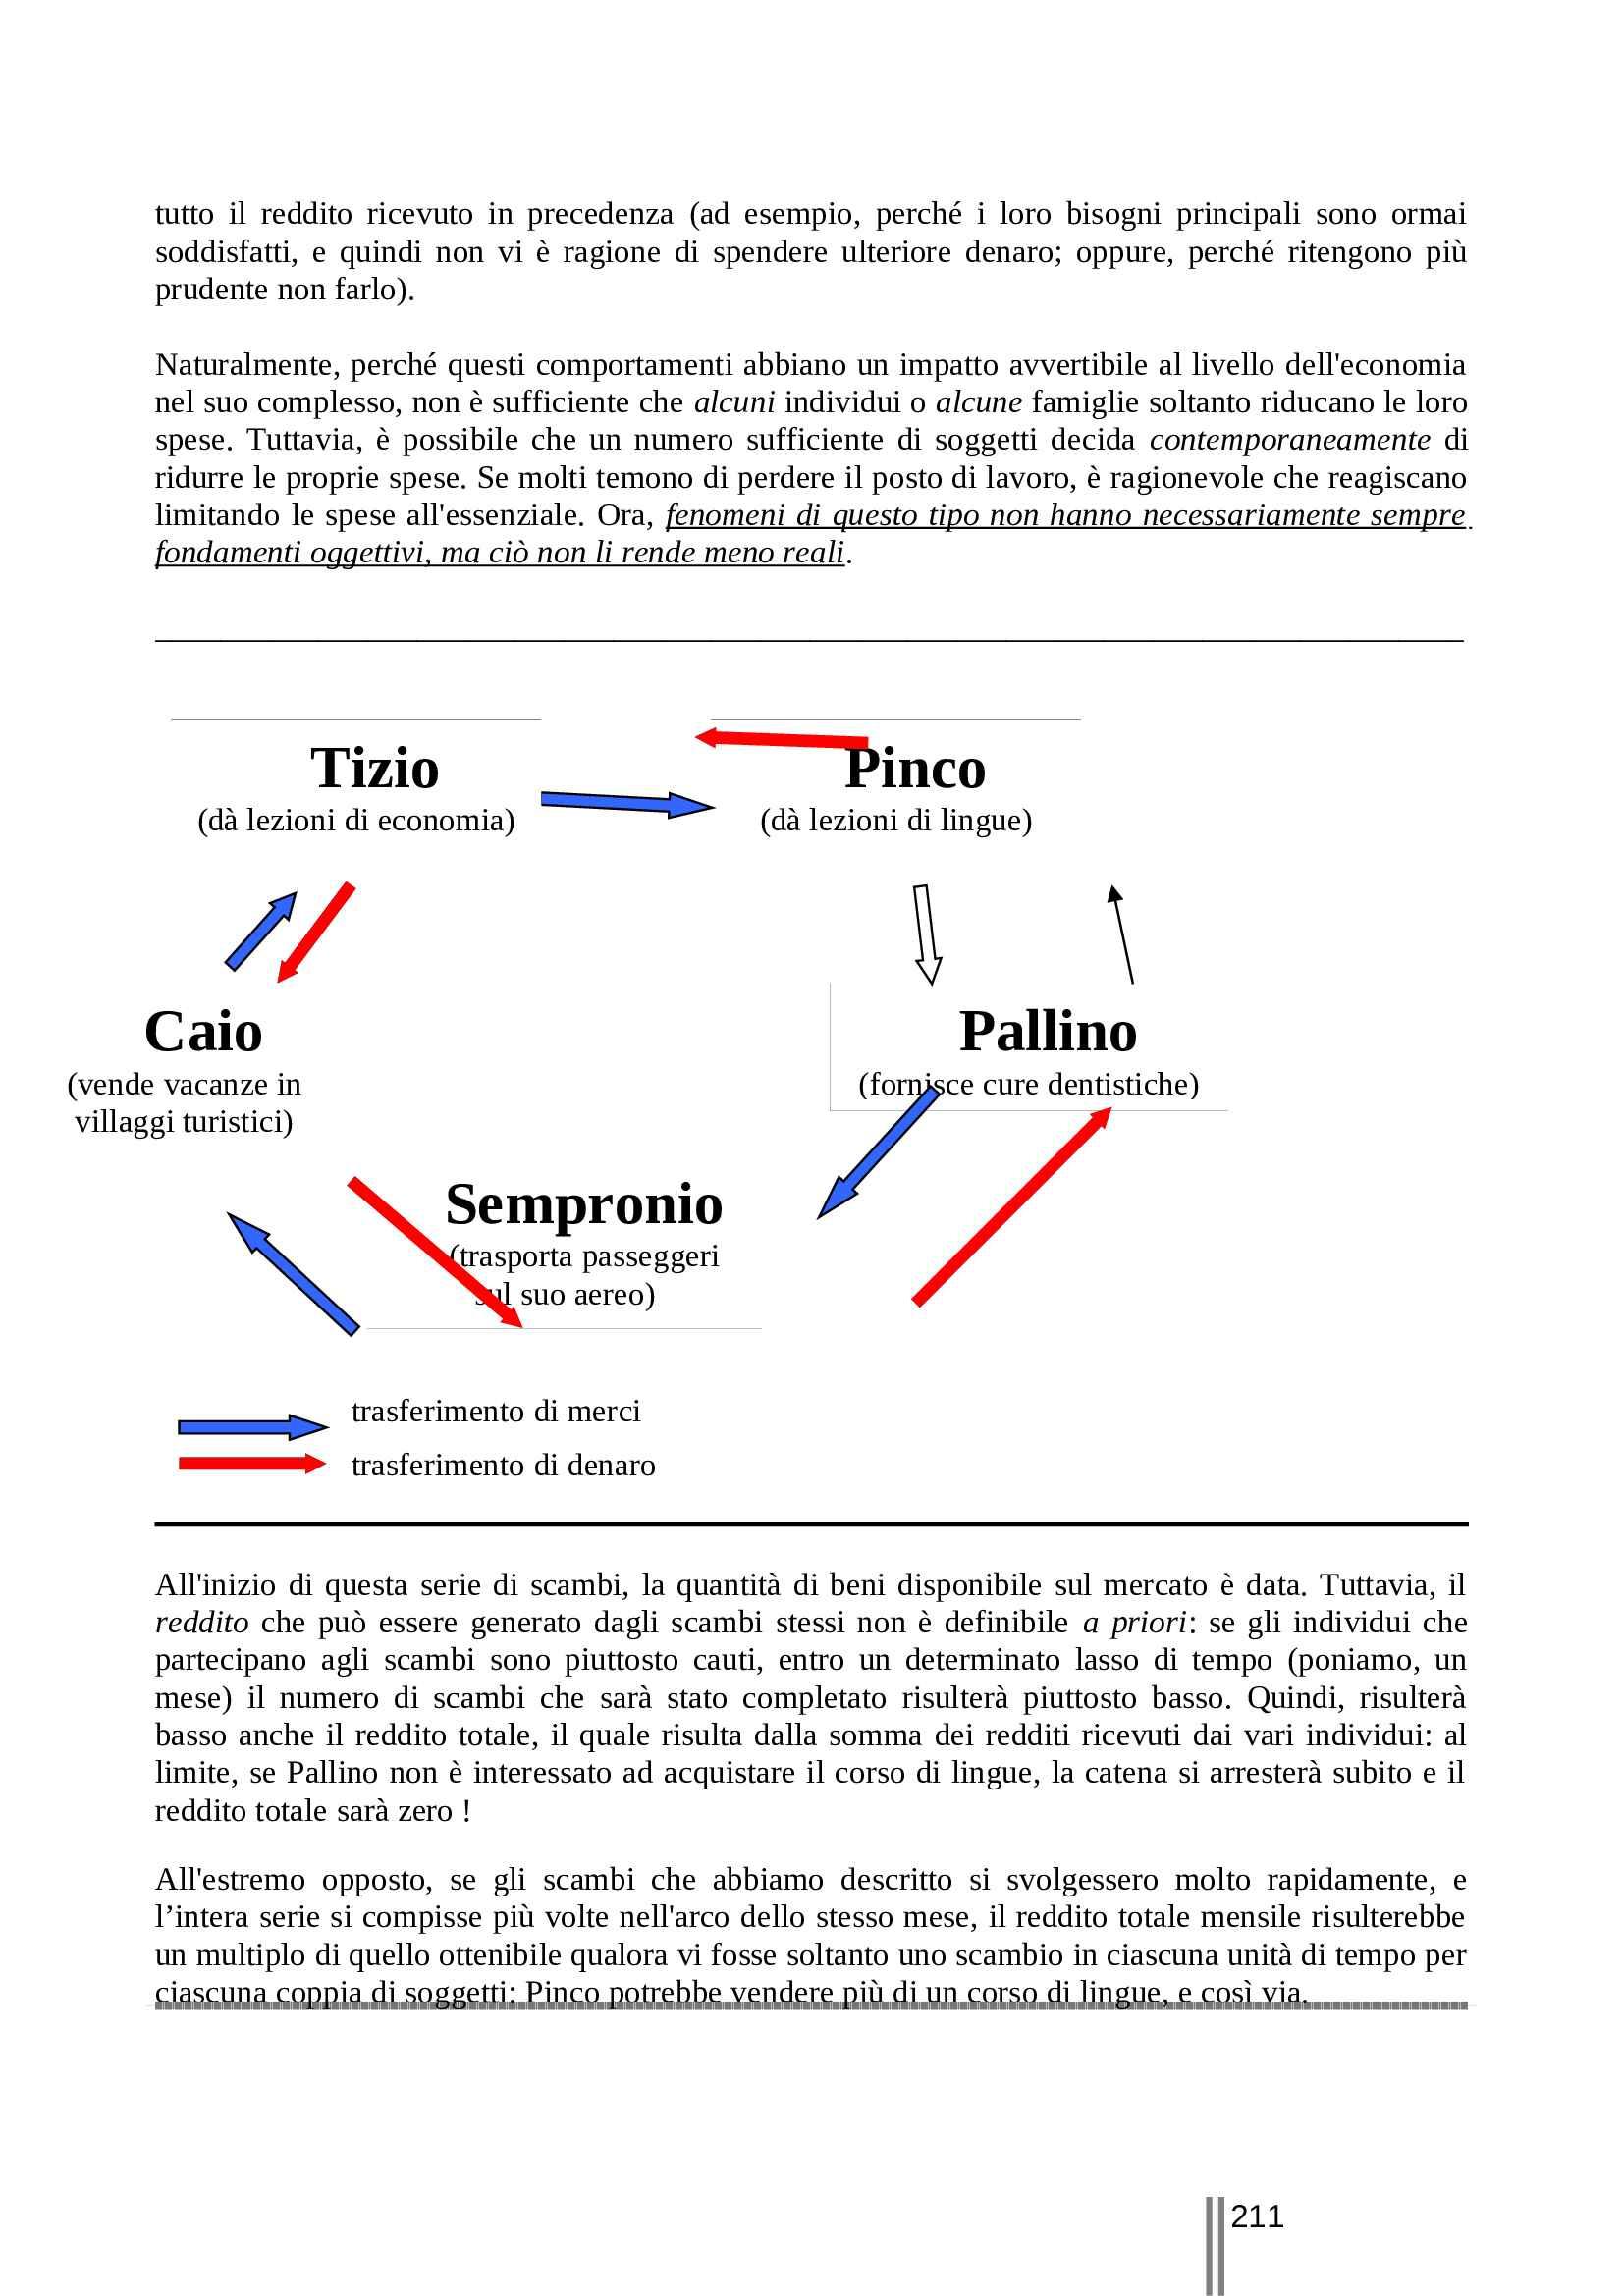 Macroeconomia - Appunti Pag. 11